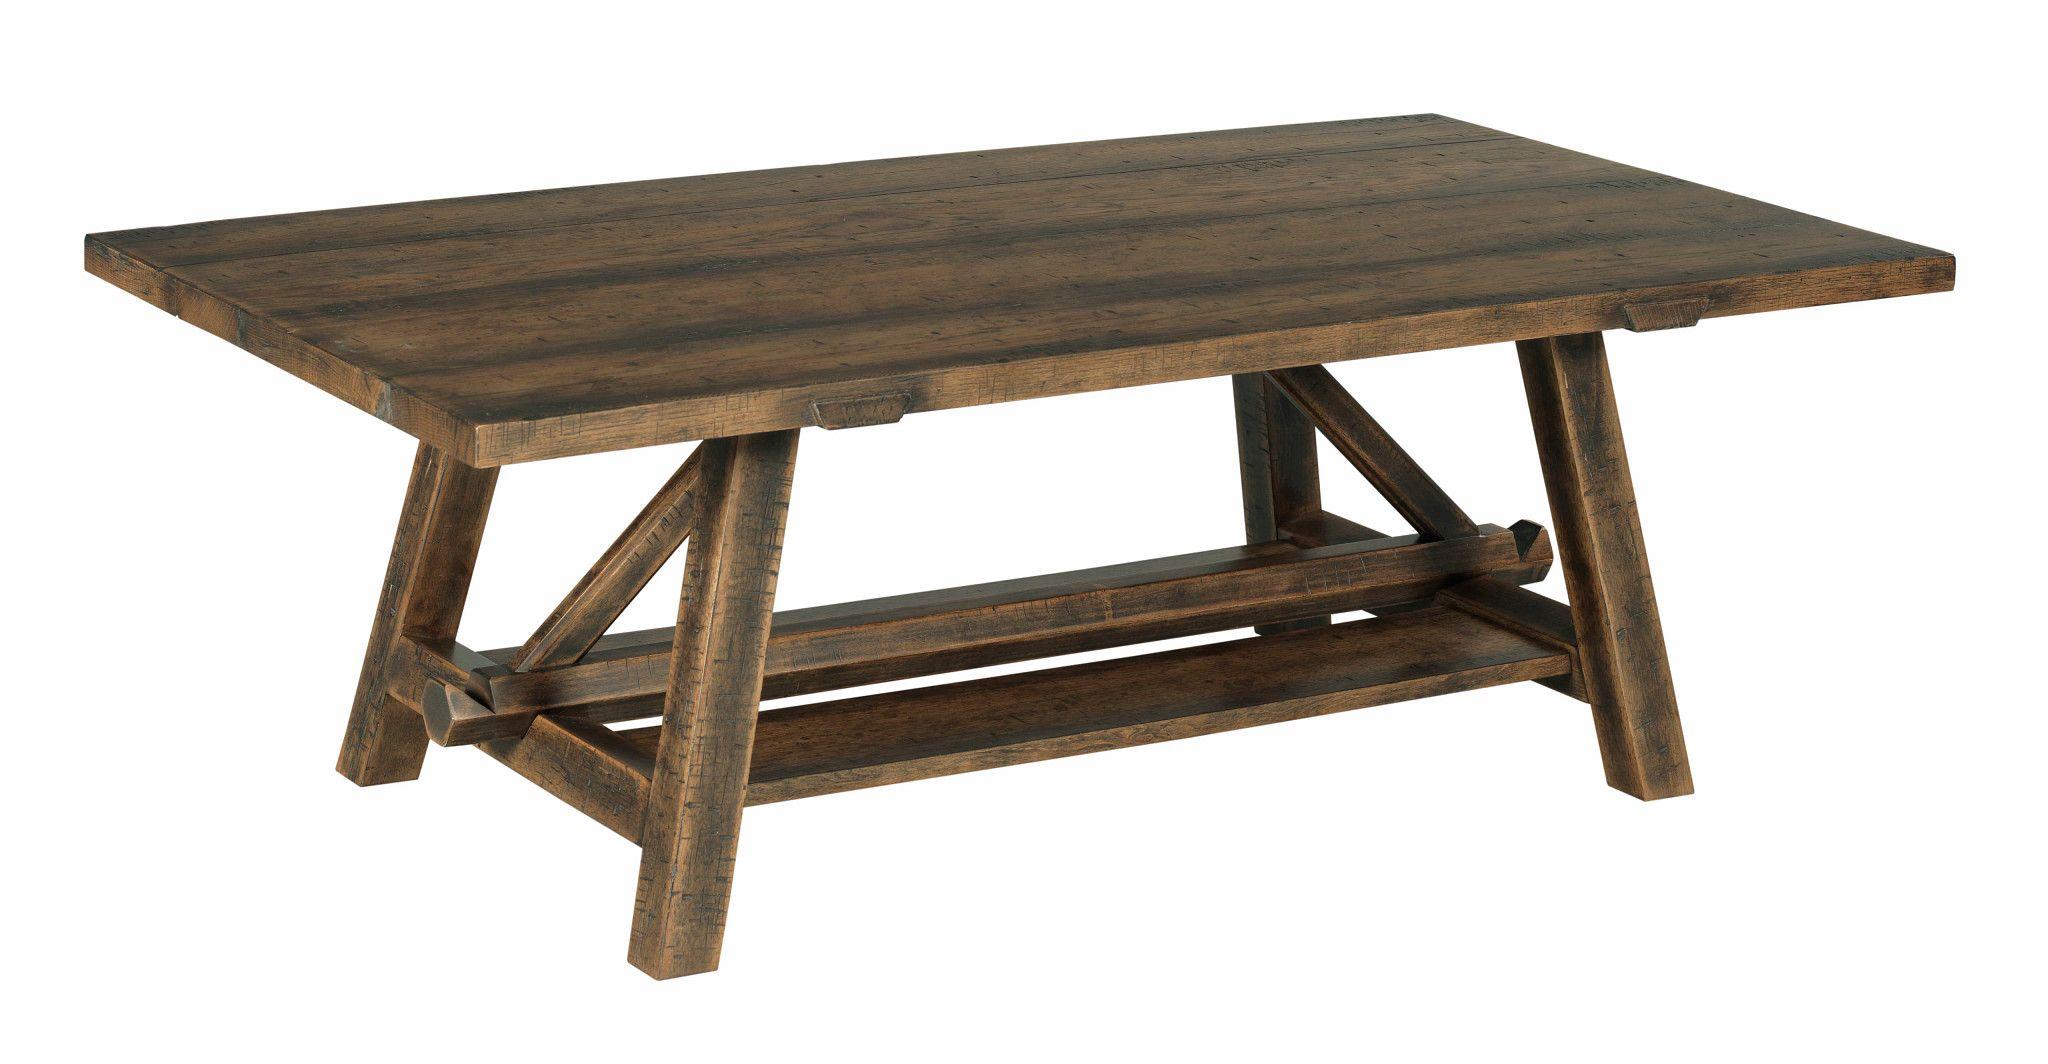 Tamarack Coffee Table by Hammary at Alison Craig Home Furnishings